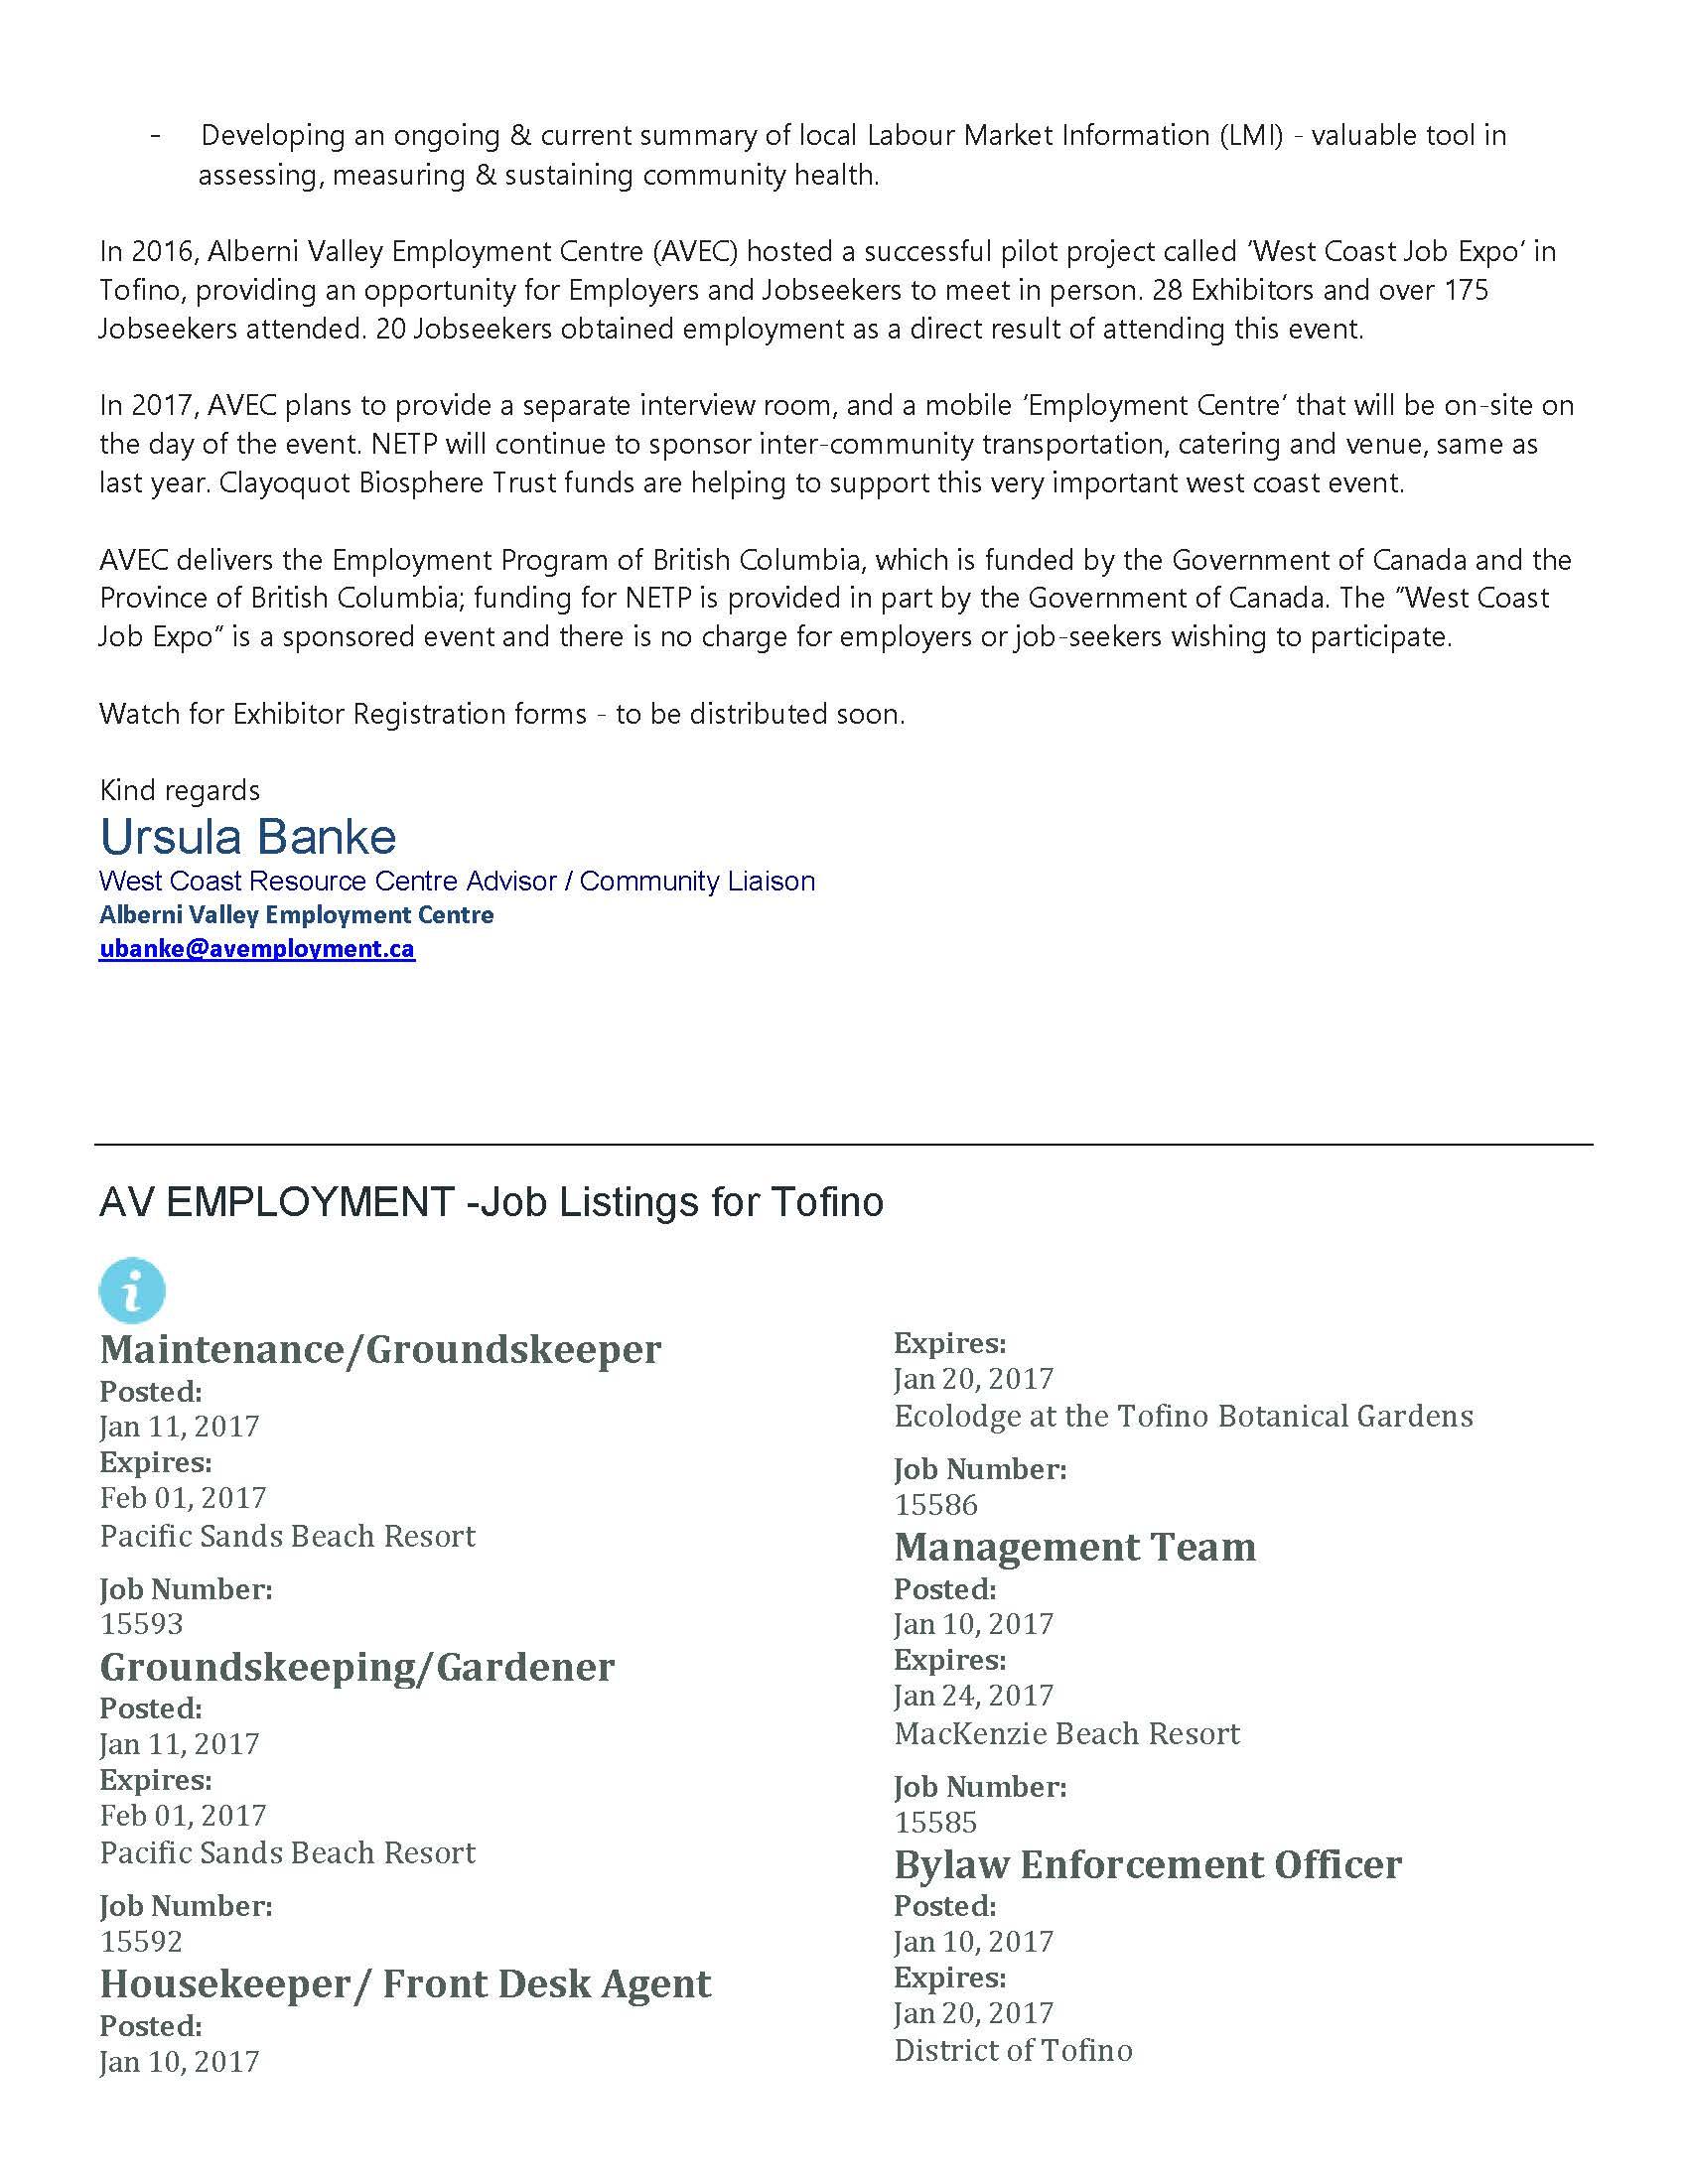 TFN Bulletin January 15-2017_Page_12.jpg